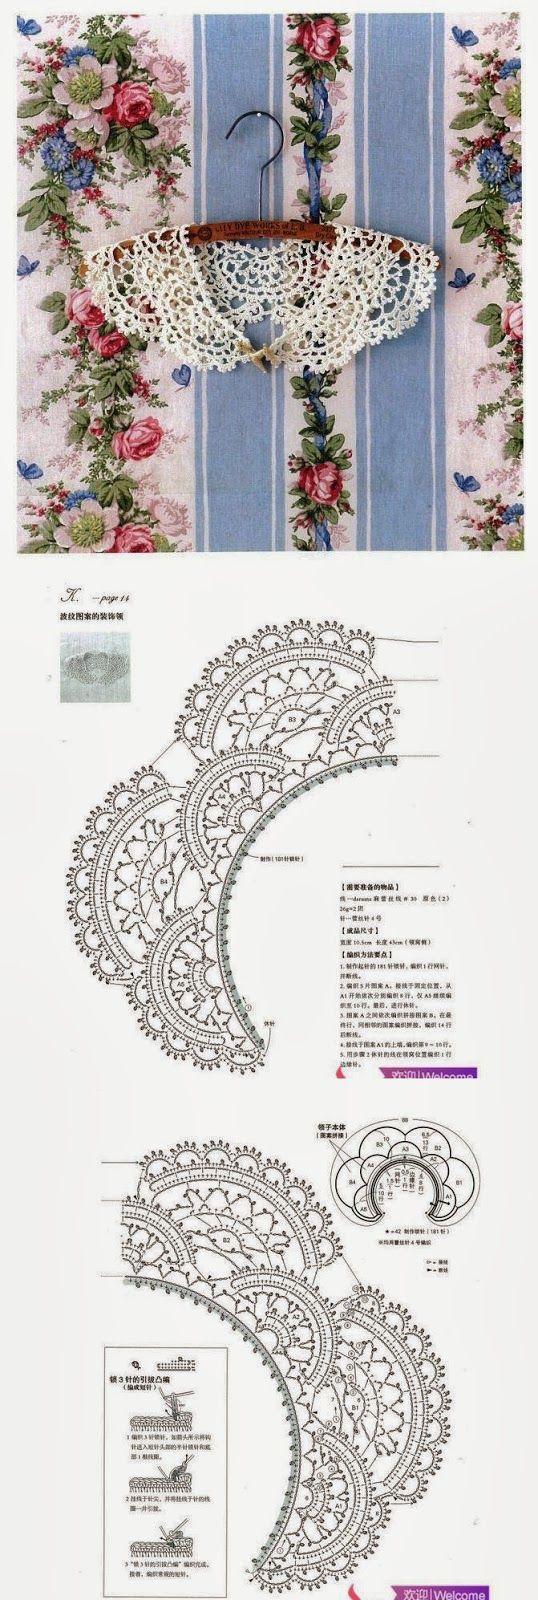 Cuello Vintage Patron - Patrones Crochet | crochet,,,, | Pinterest ...